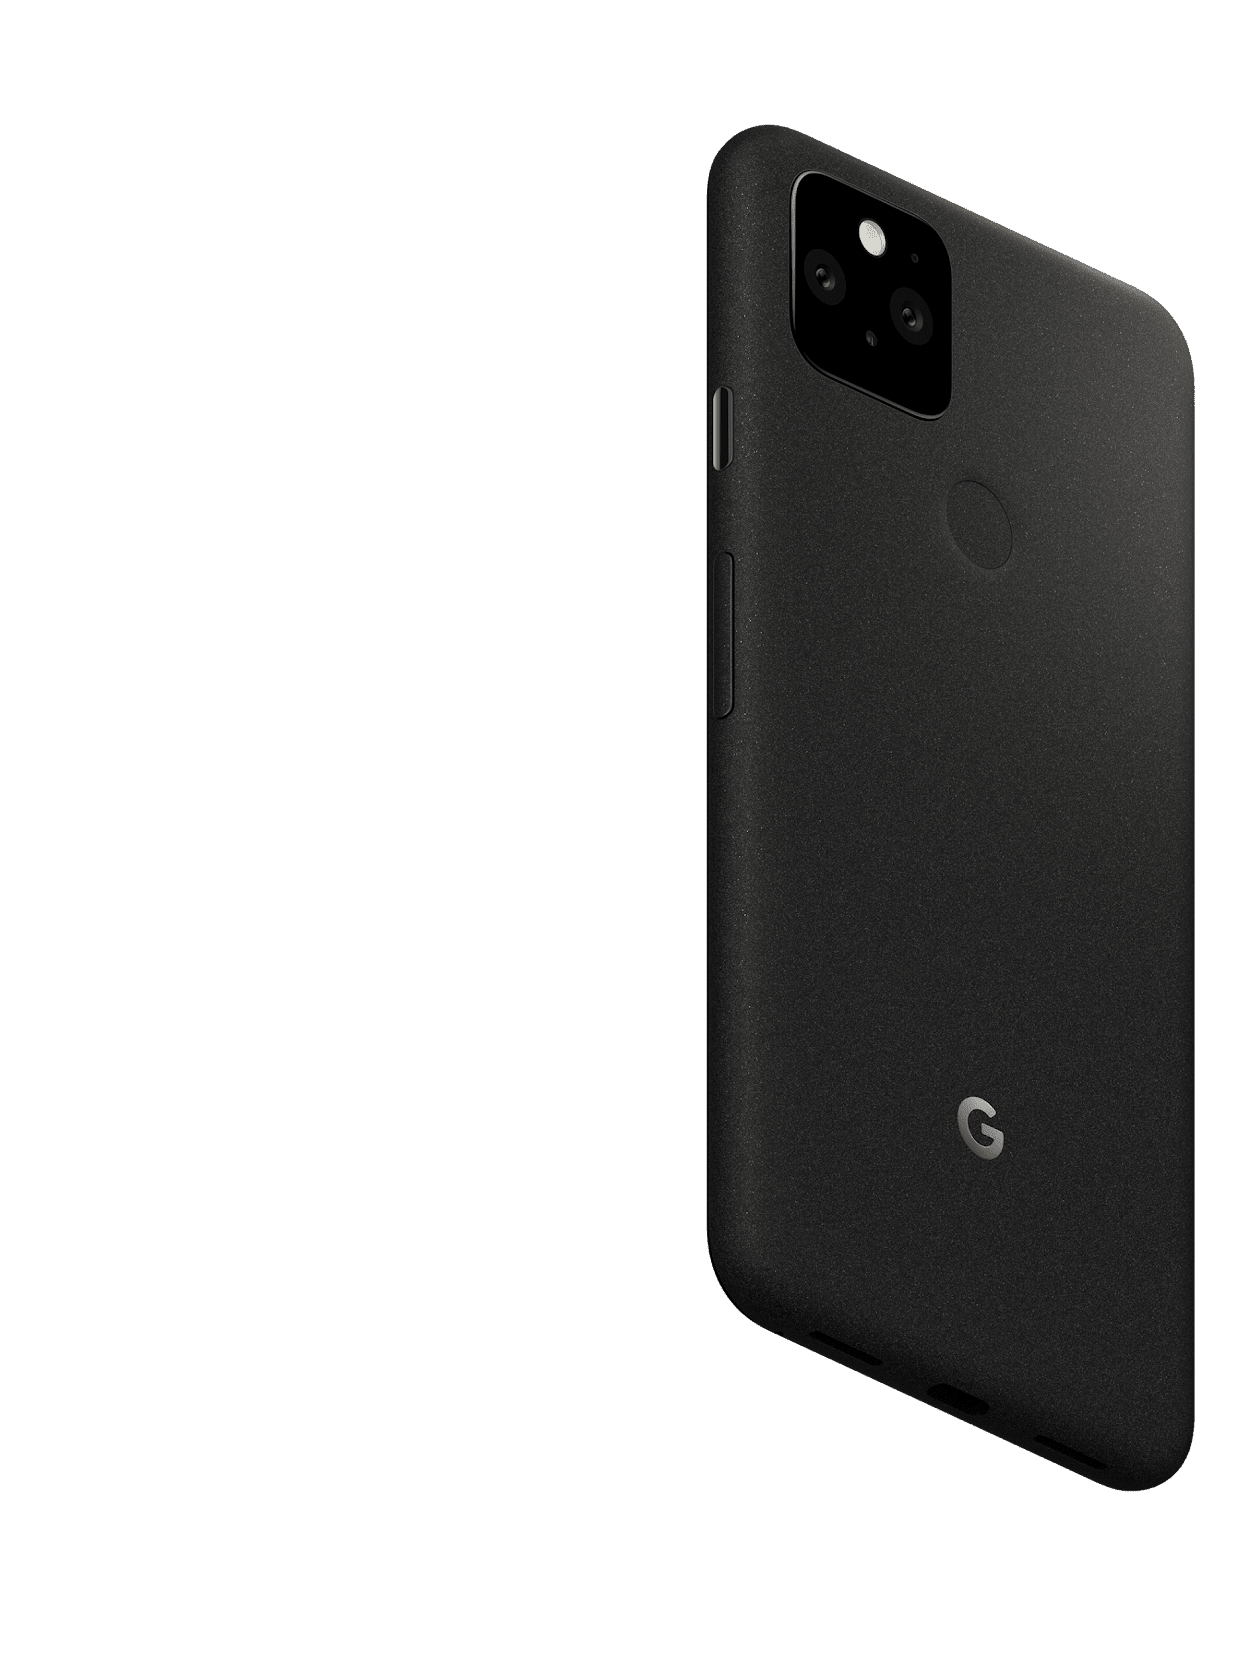 device back dark